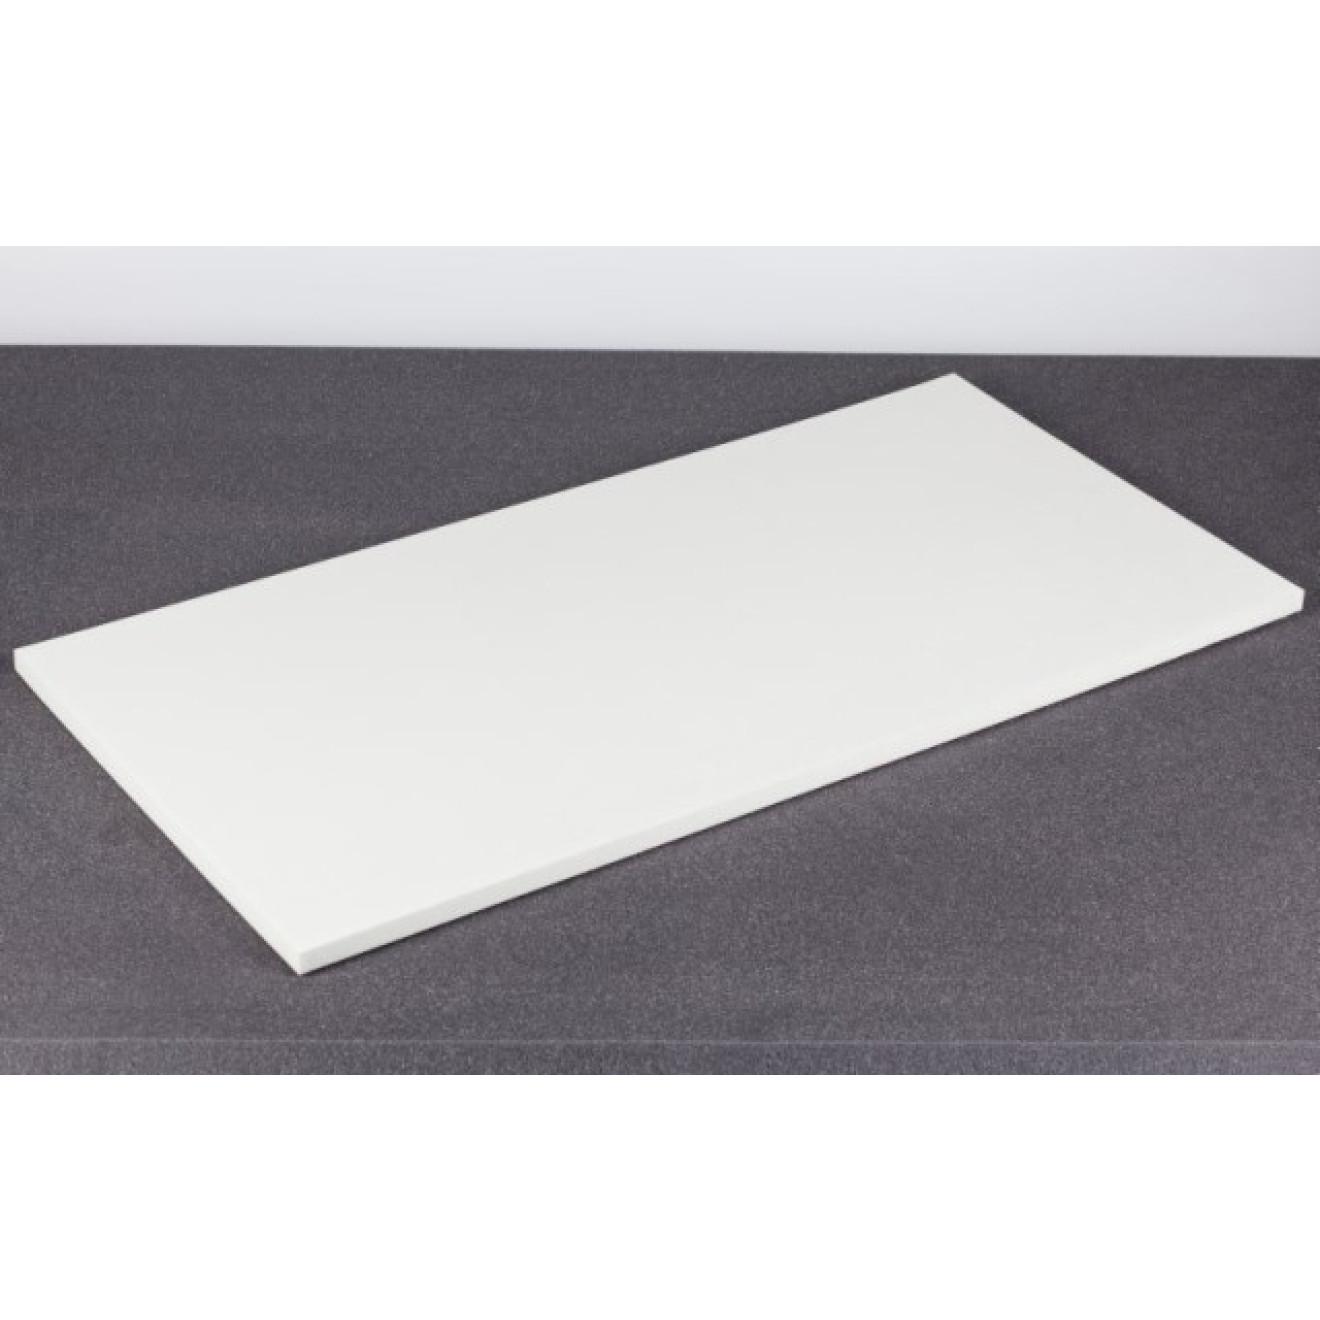 polyethylen pe schaumstoff 100x50x2cm weiss. Black Bedroom Furniture Sets. Home Design Ideas